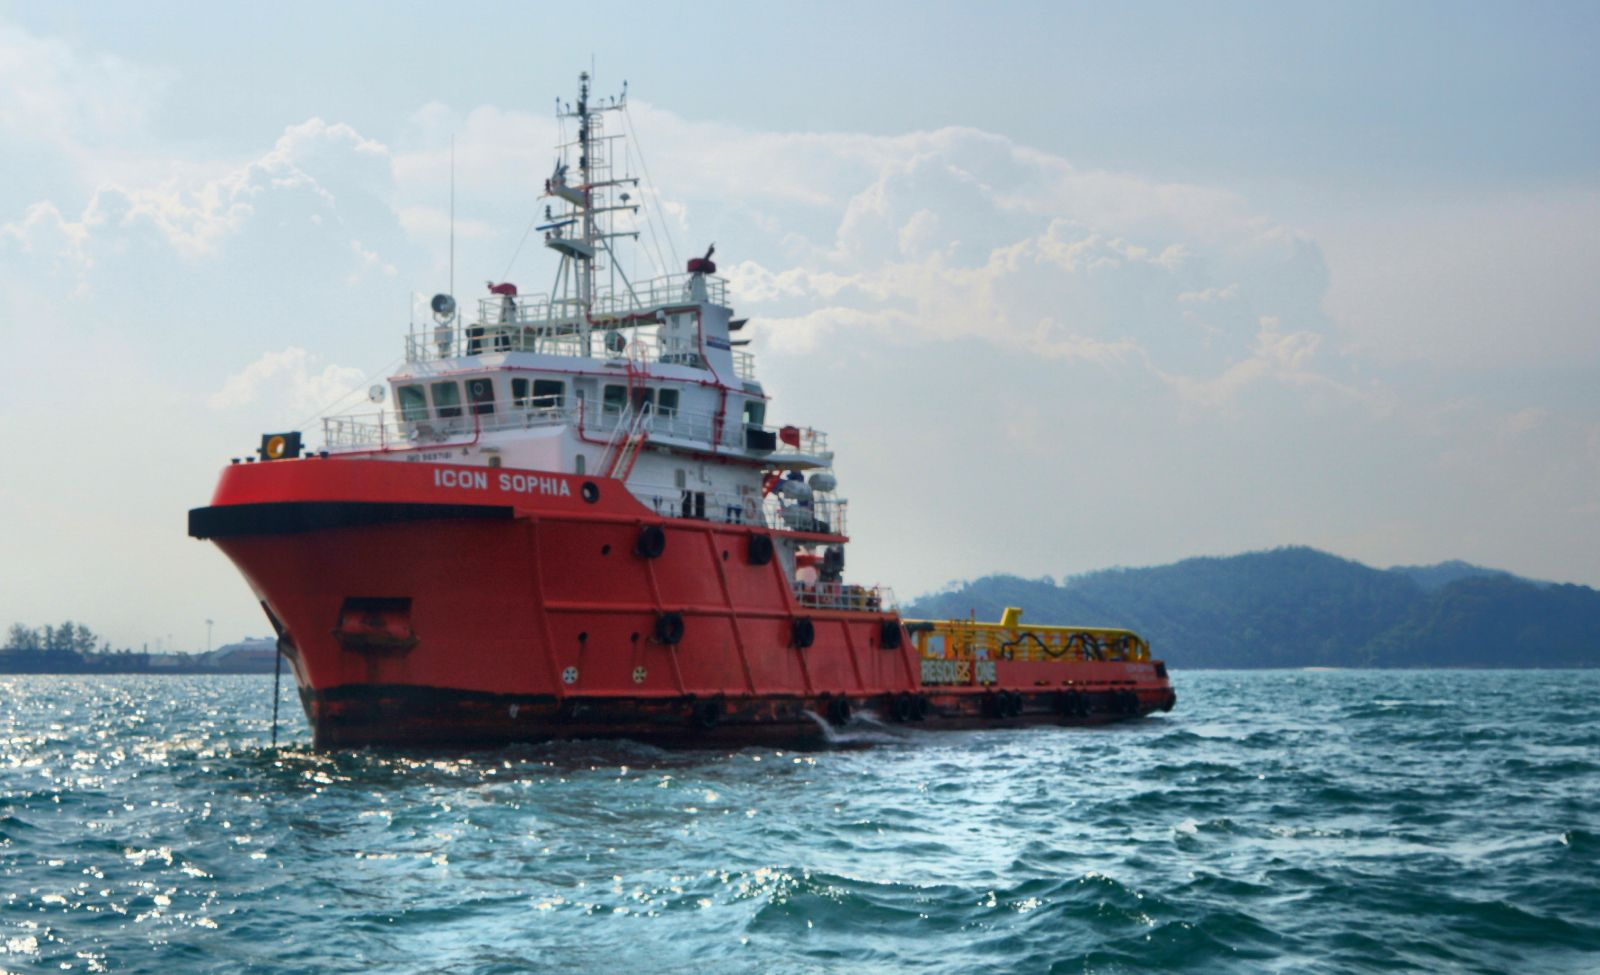 dp2 vessels